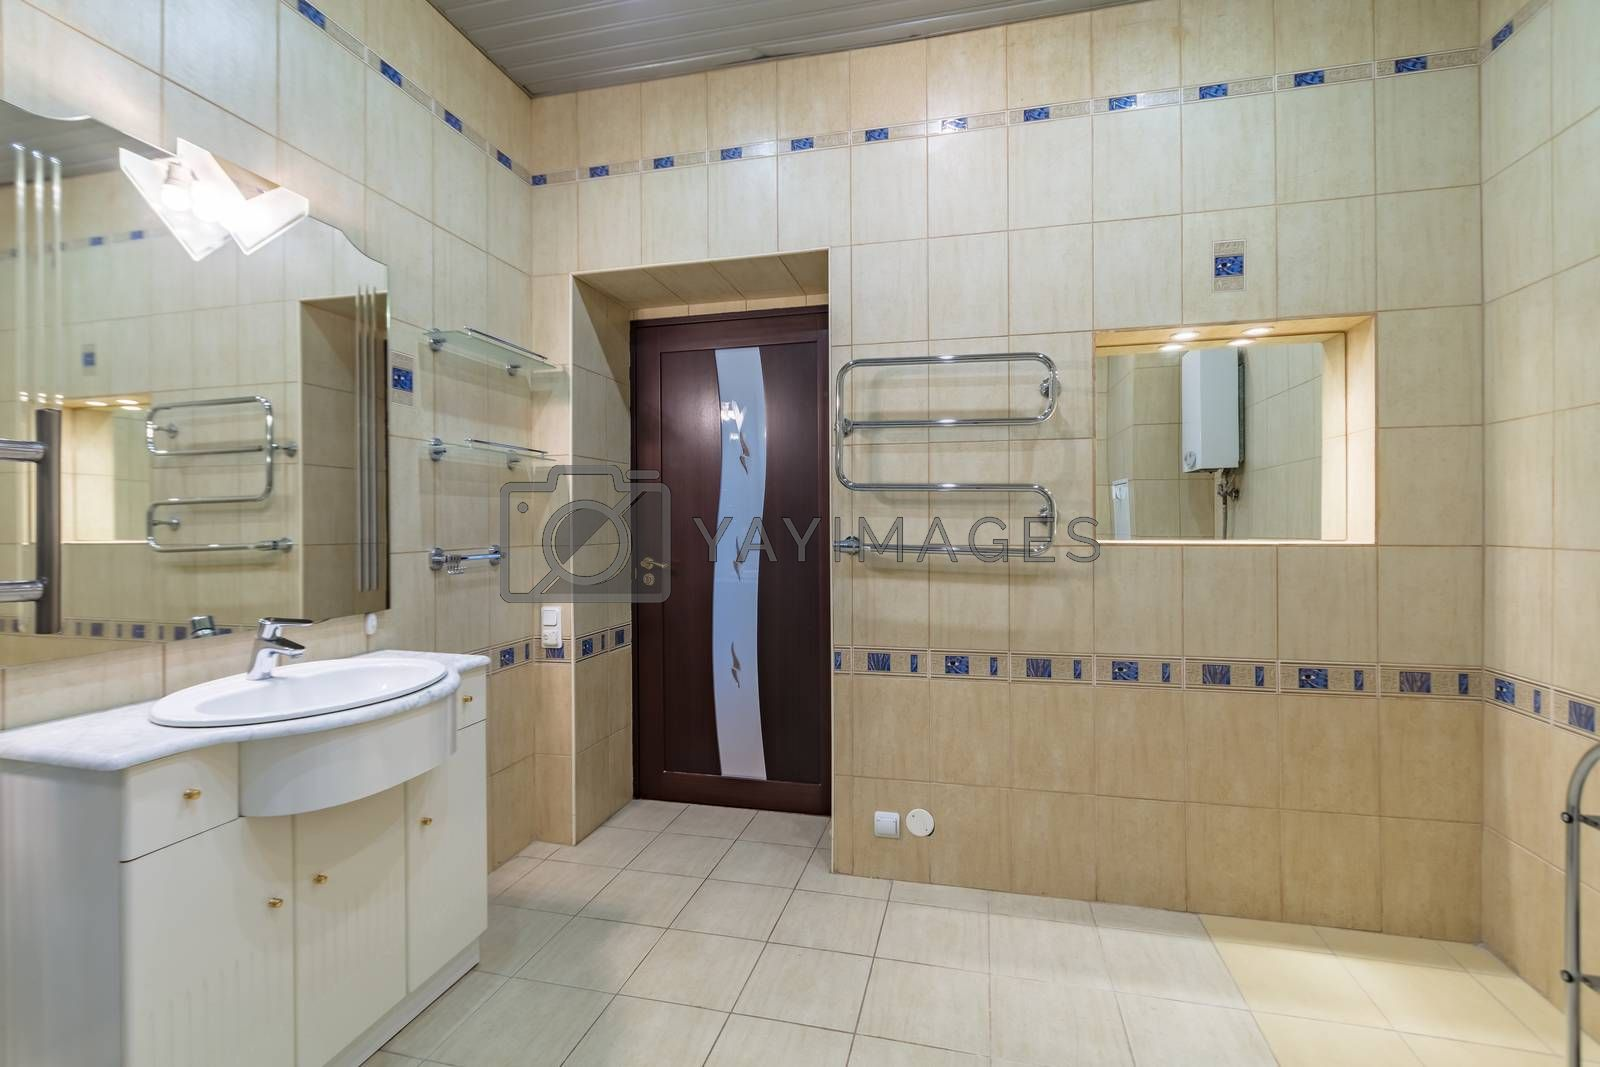 modern mirror and ceramic sink in bathroom